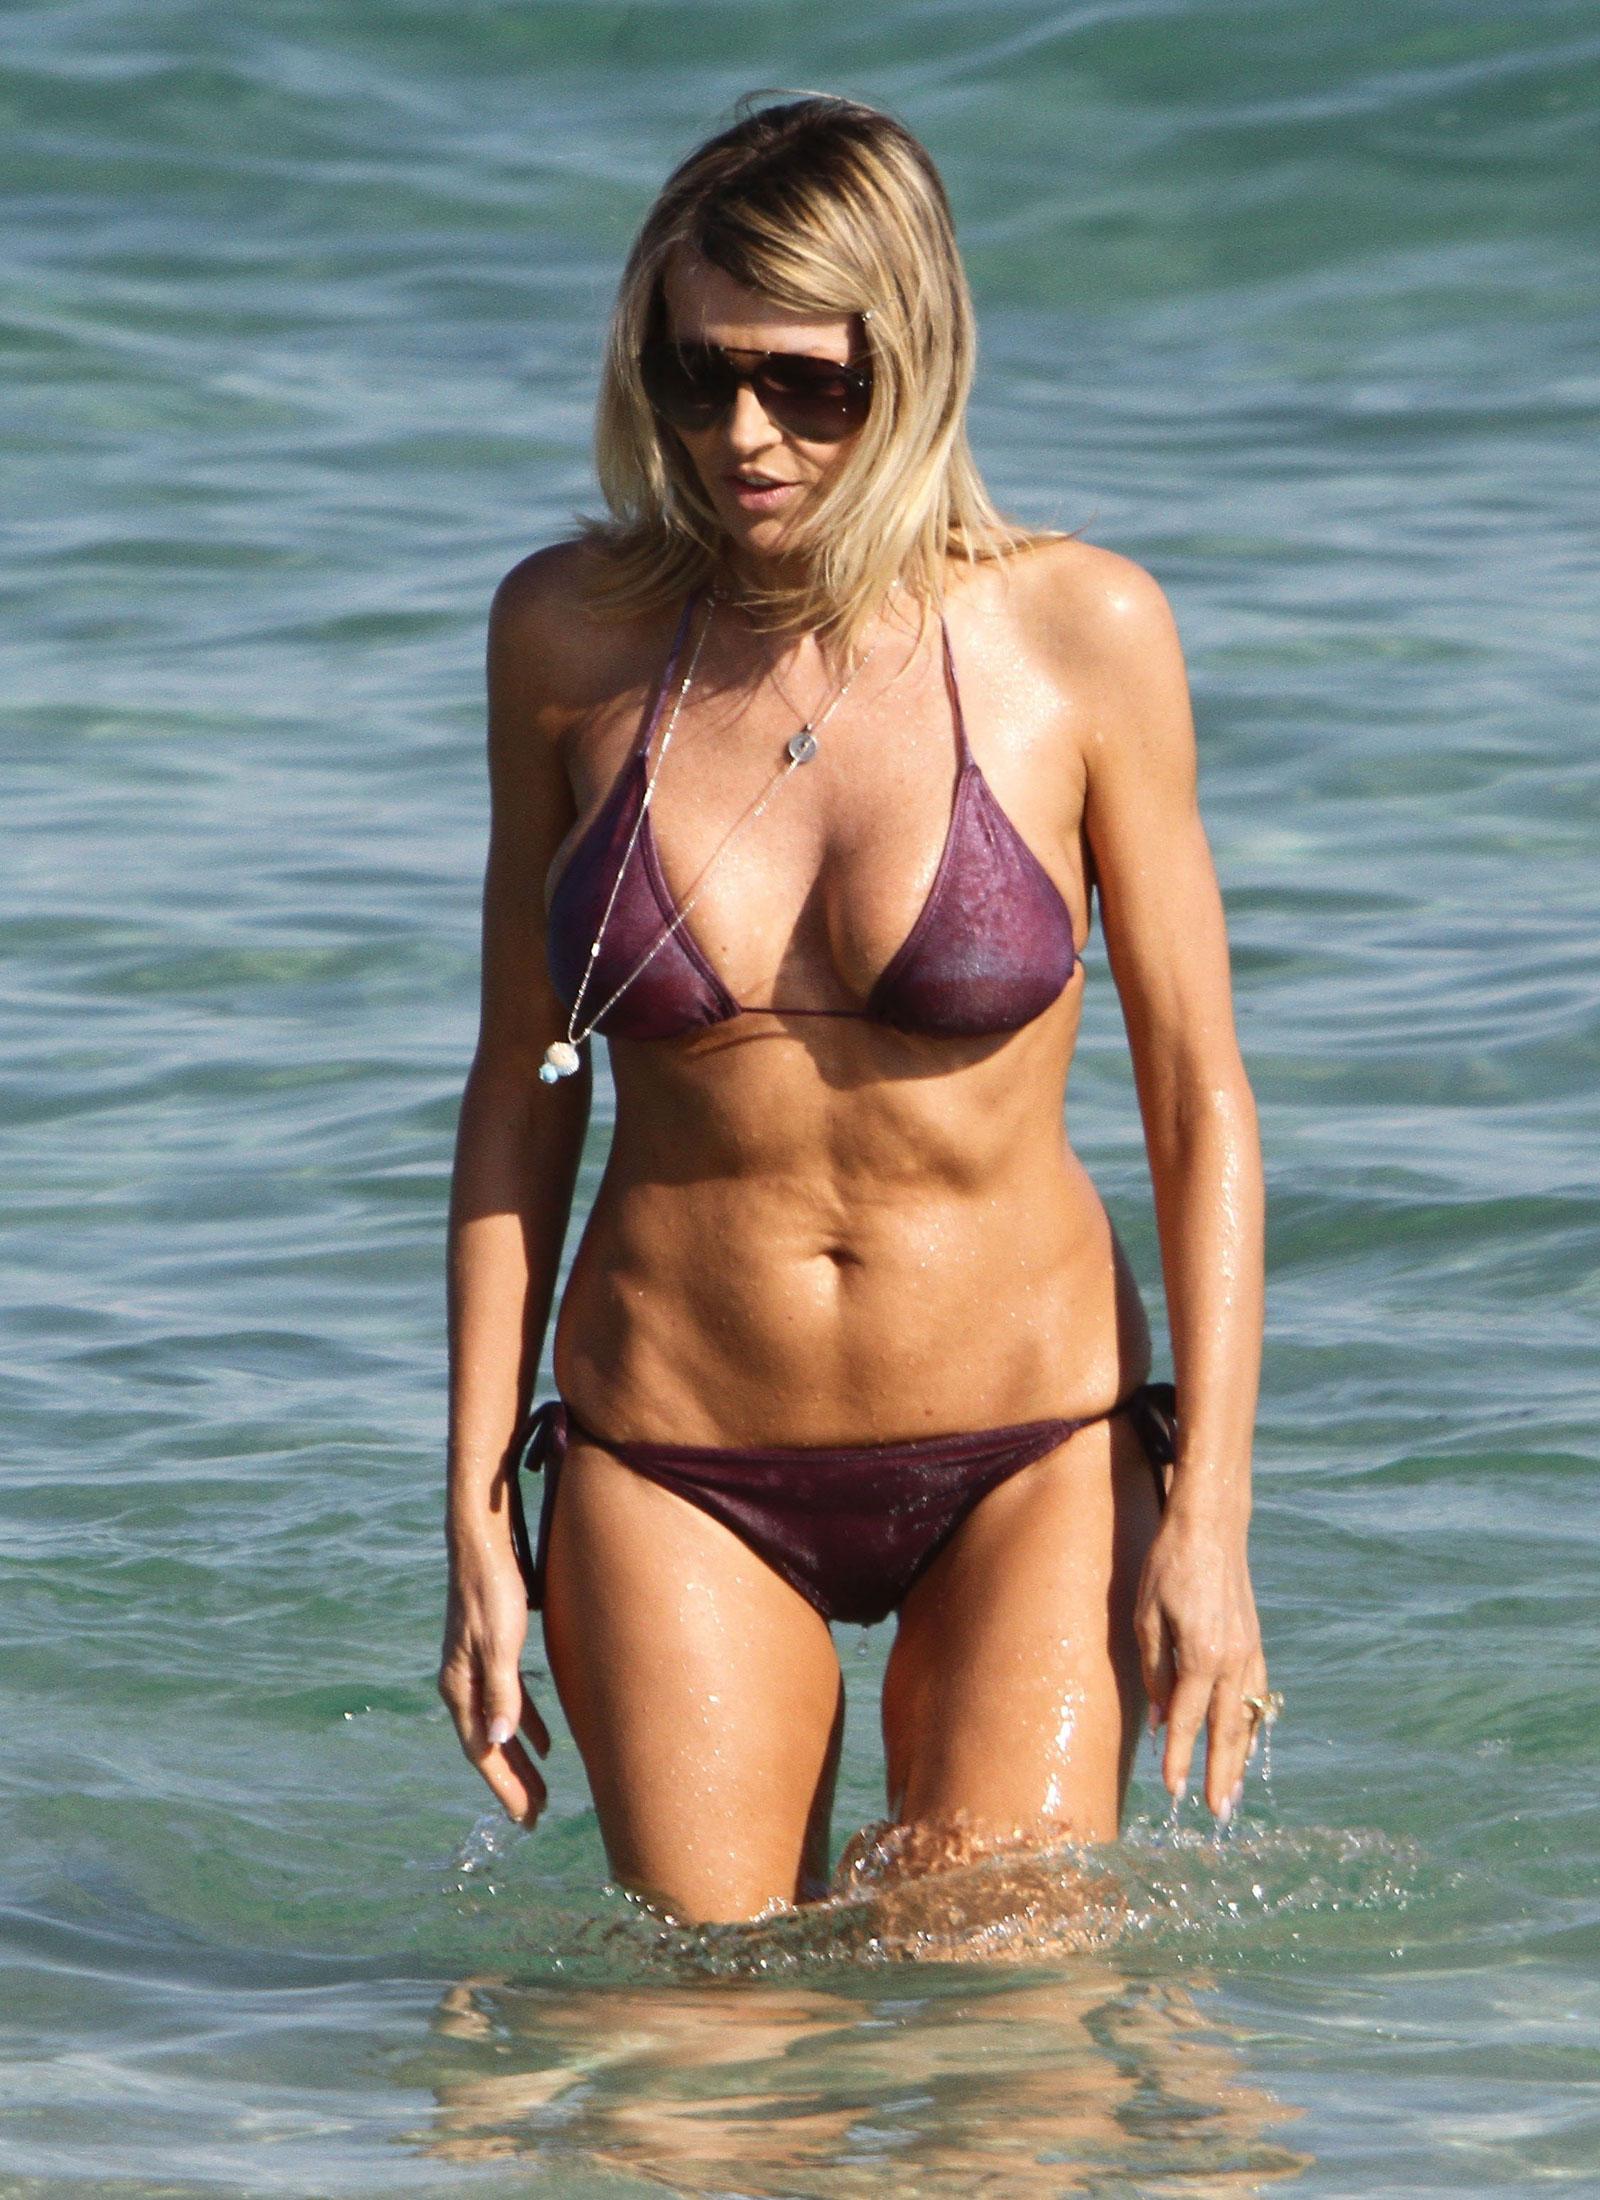 Sex Danielle Mason nude (18 photos), Tits, Hot, Feet, panties 2015